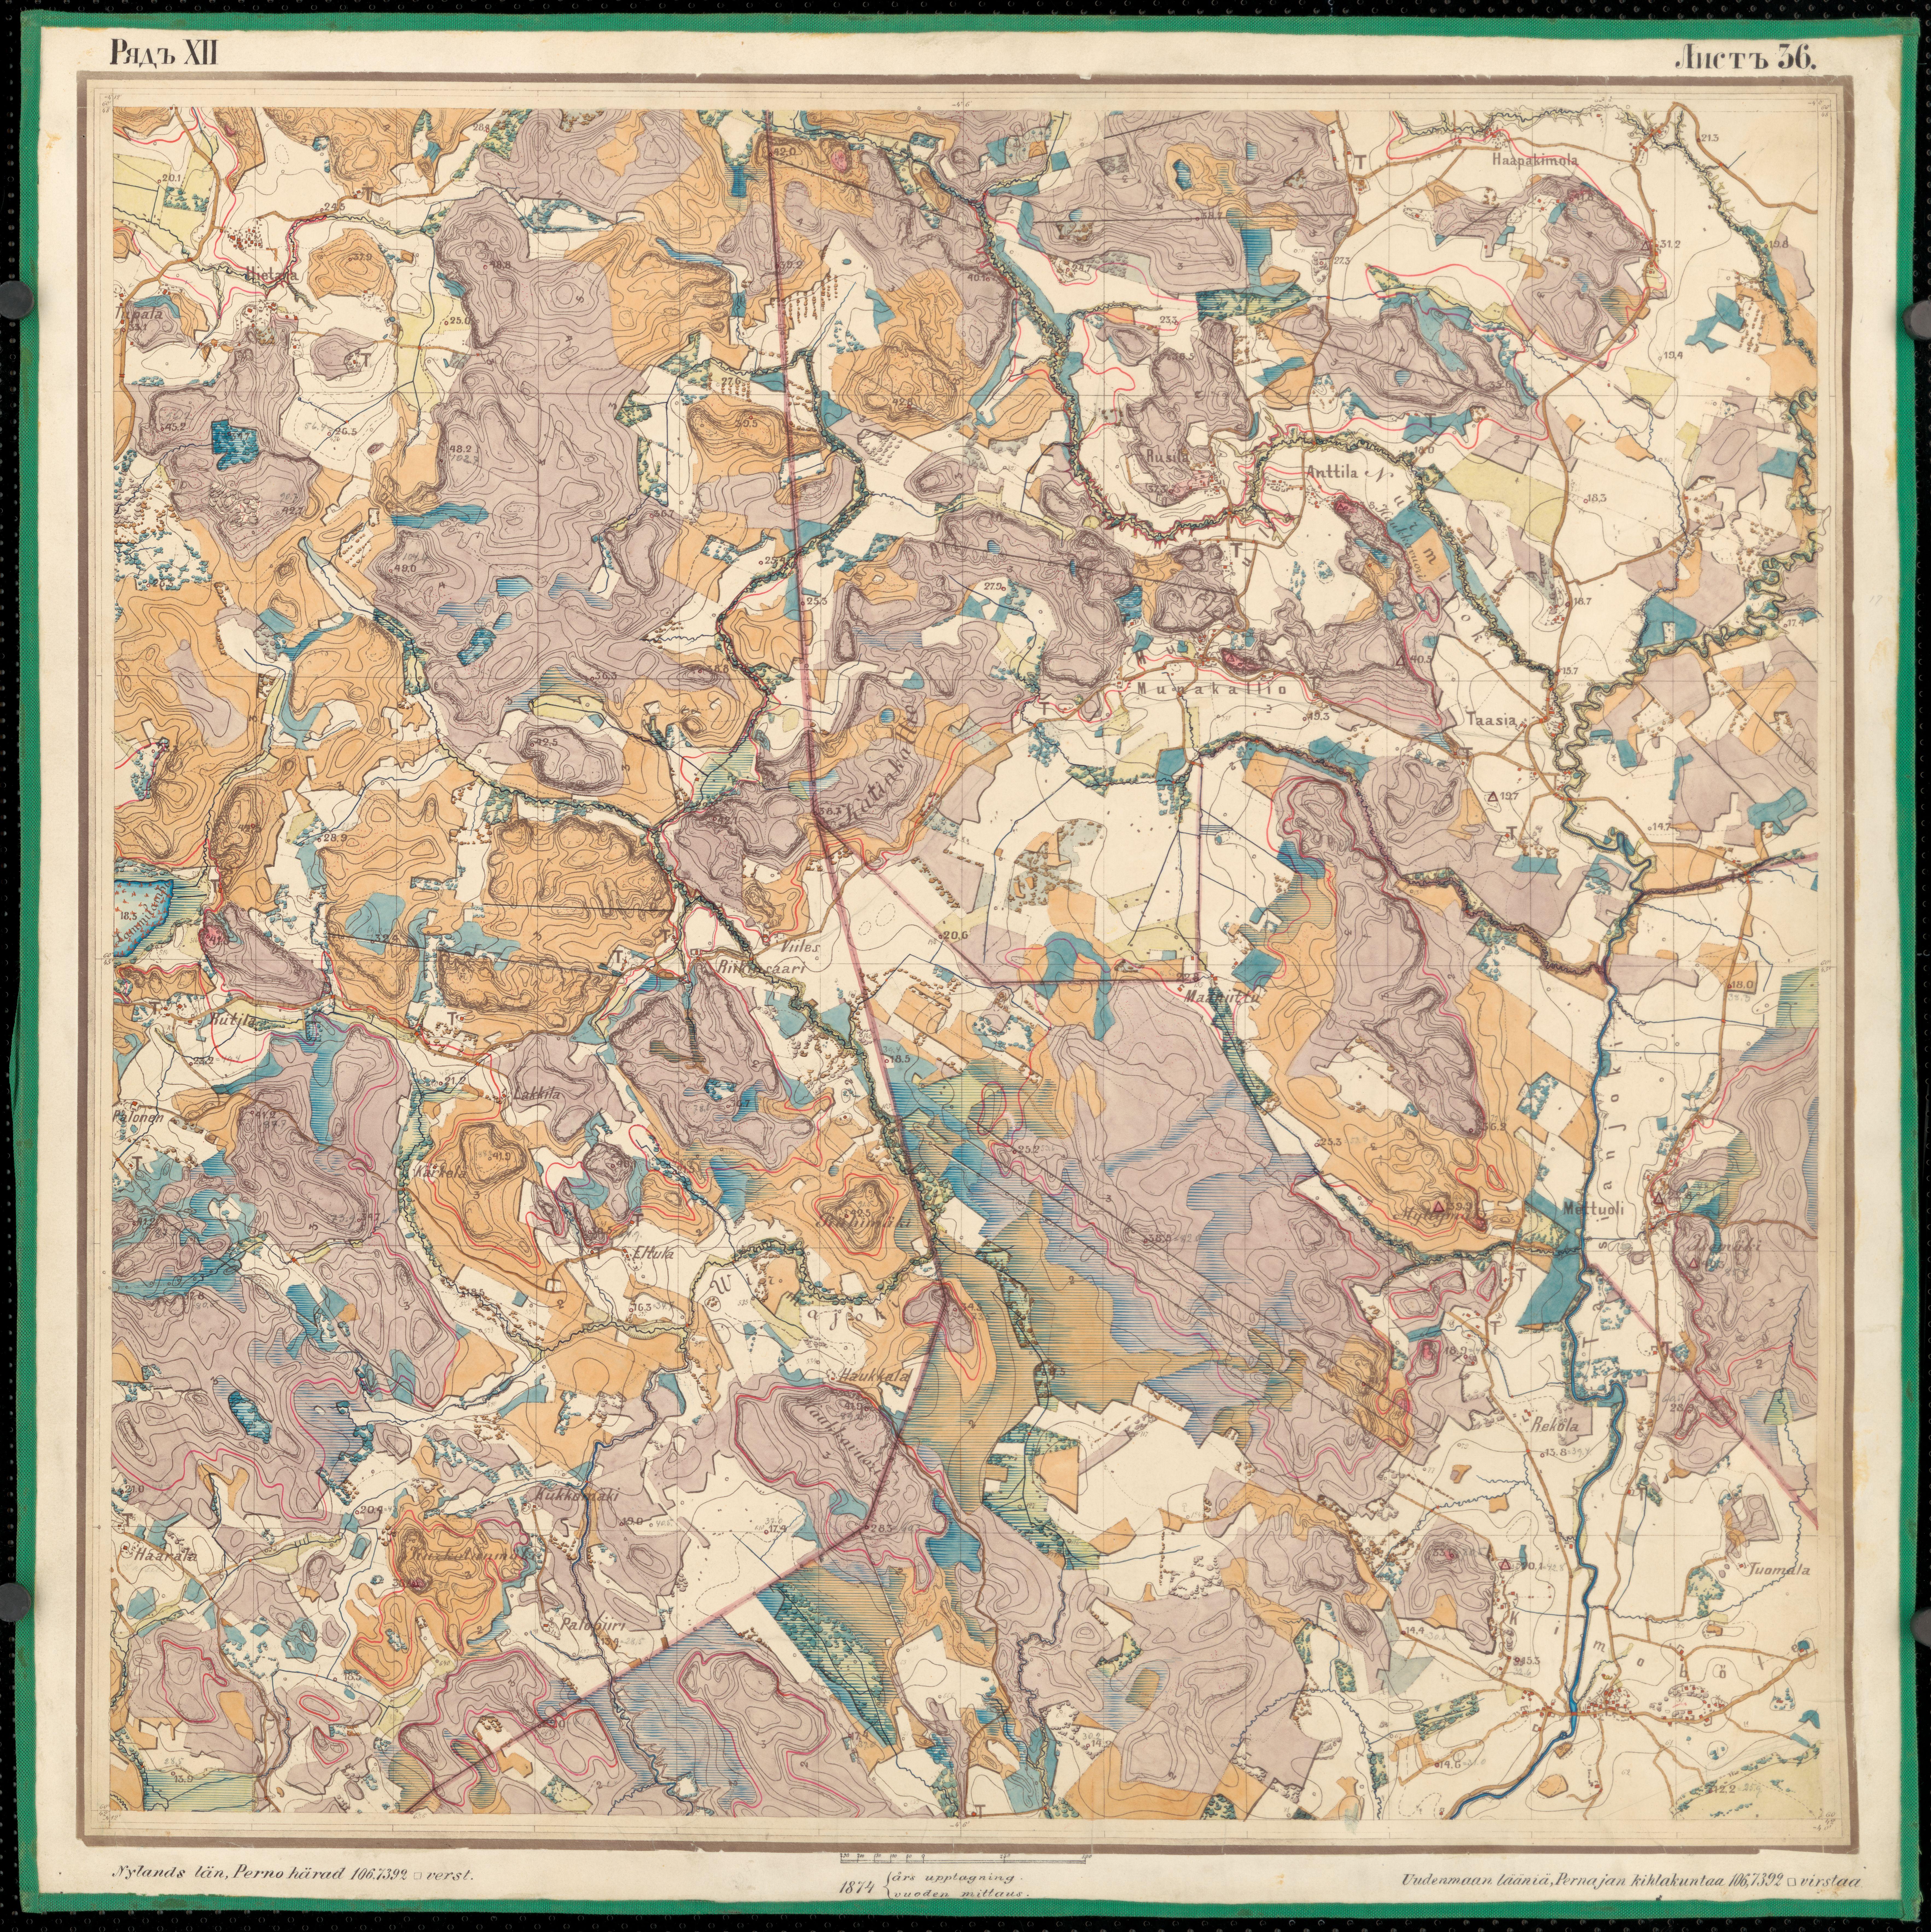 File Senate Atlas 1870 1907 Sheet Xii 36 Artjarvi Jpg